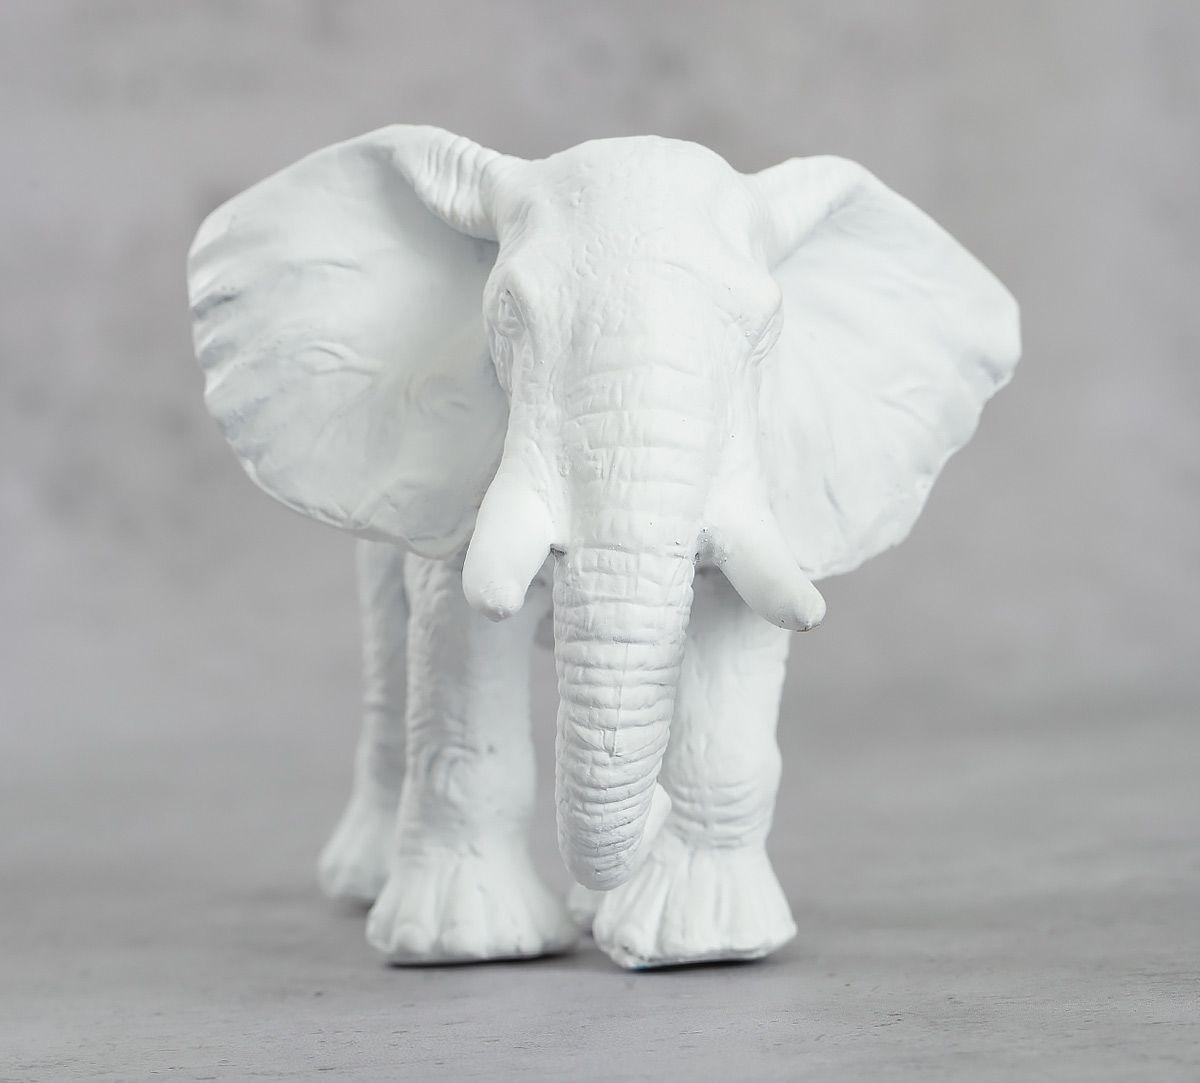 India Circus White Baby Elephant Figurine